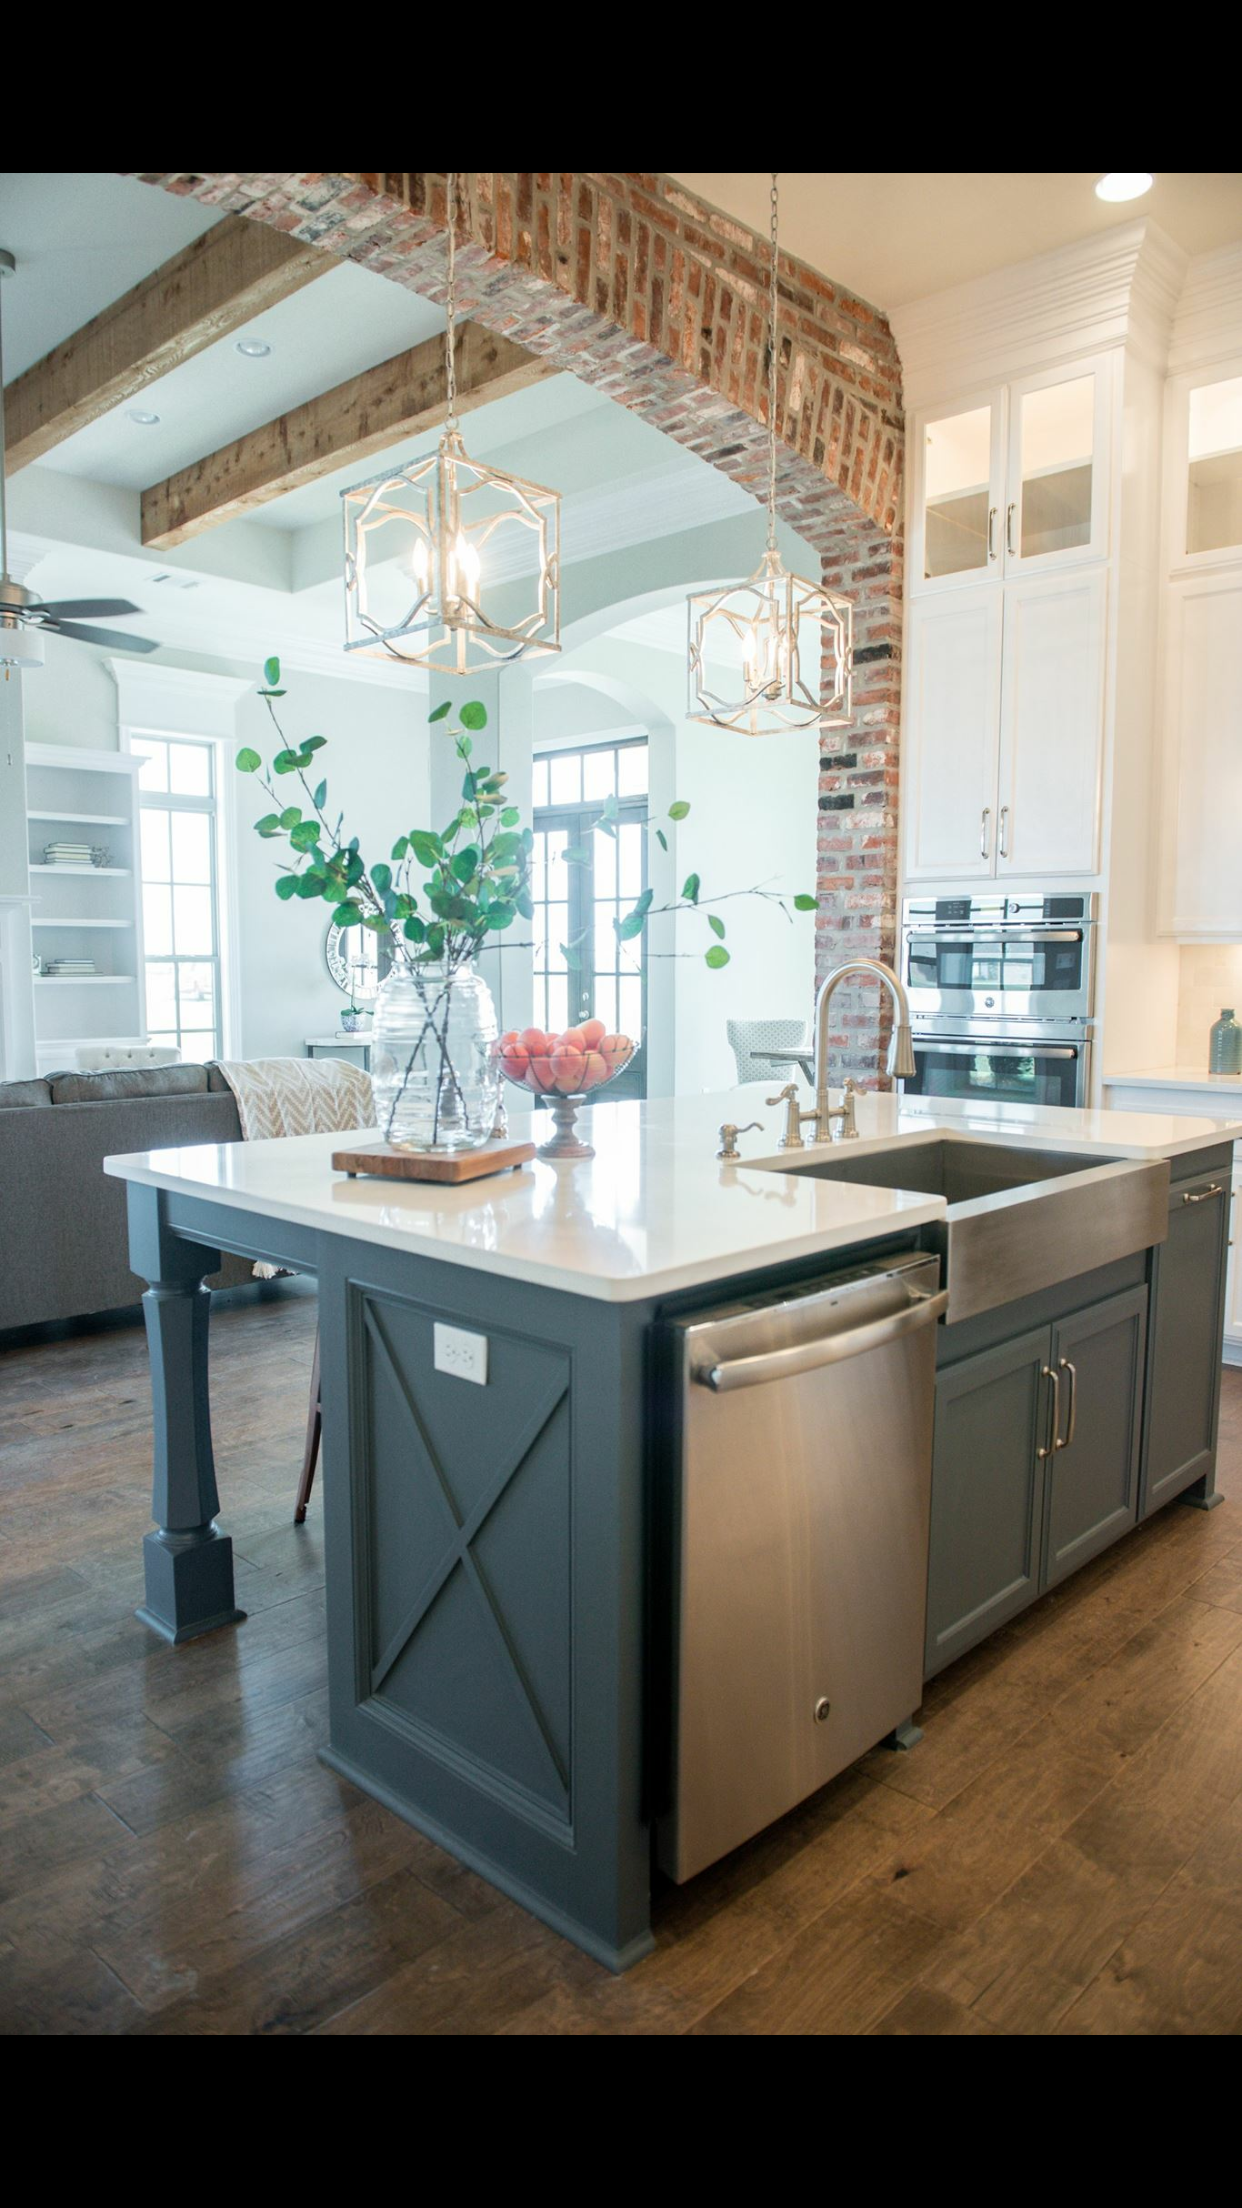 The Wood Beams And Brickwork Modern Kitchen Design Modern Kitchen Earthy Home Decor